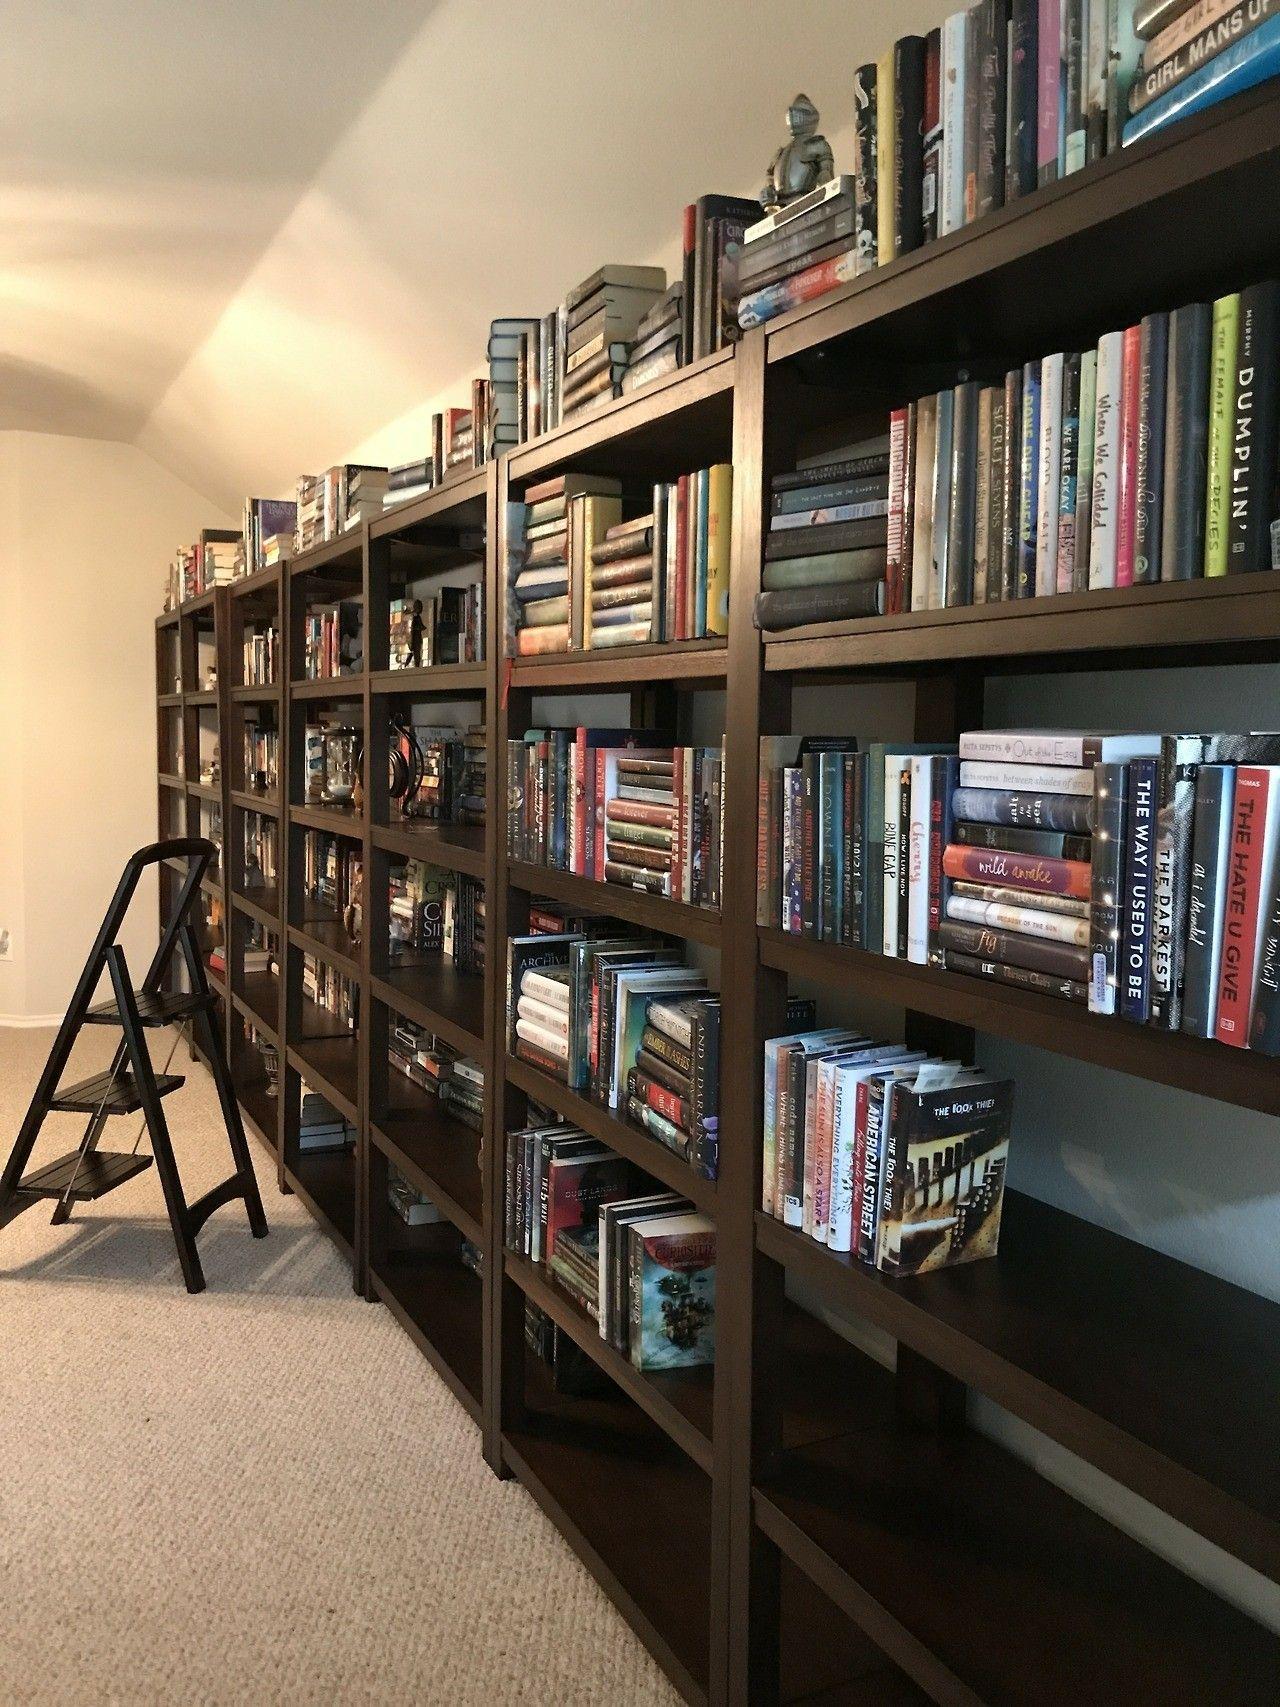 An empty bookshelf is full of potential books pinterest empty